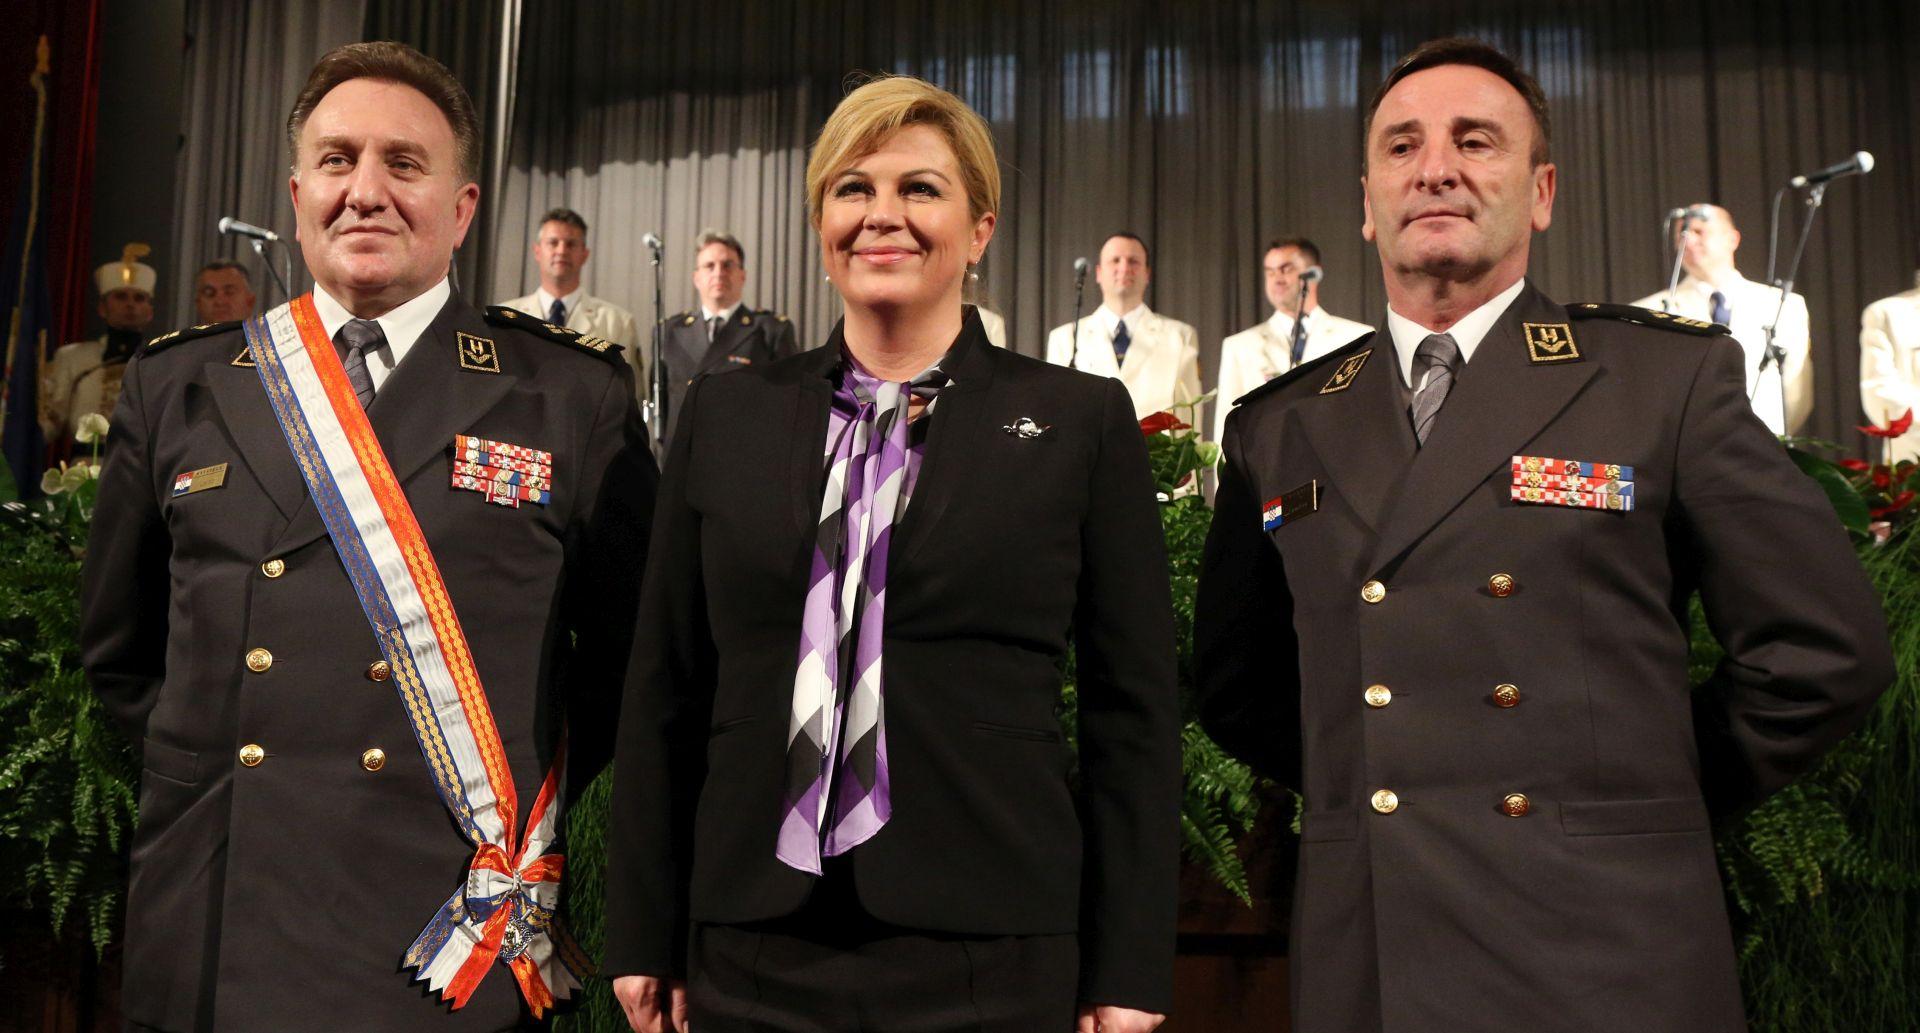 General Šundov prezeo dužnost načelnika Glavnog stožera OS RH